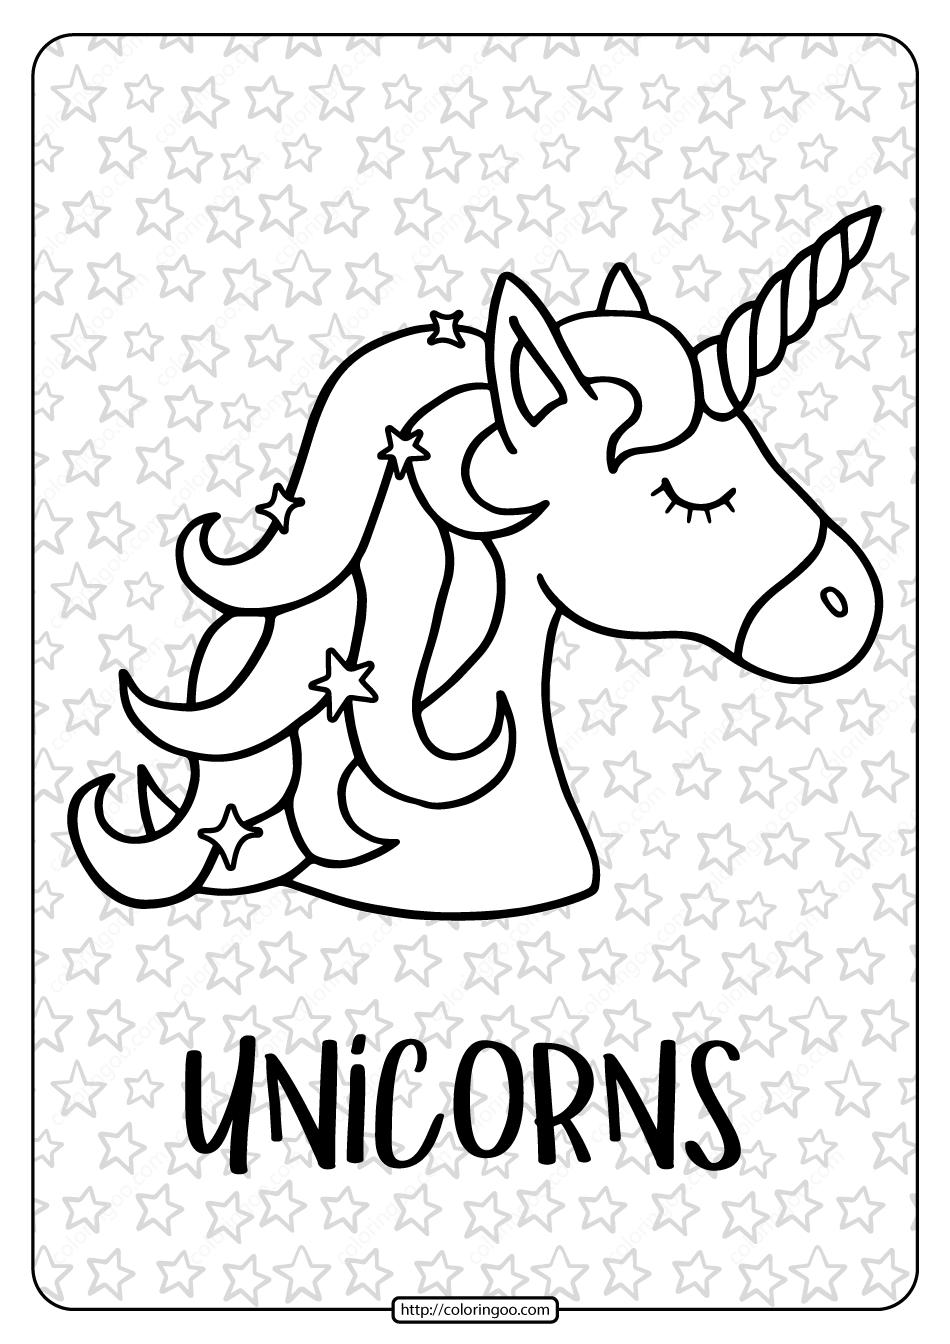 Free Printable Unicorns Are Real Pdf Coloring Page Unicorn Coloring Pages Free Kids Coloring Pages Kids Colouring Printables [ 1344 x 950 Pixel ]